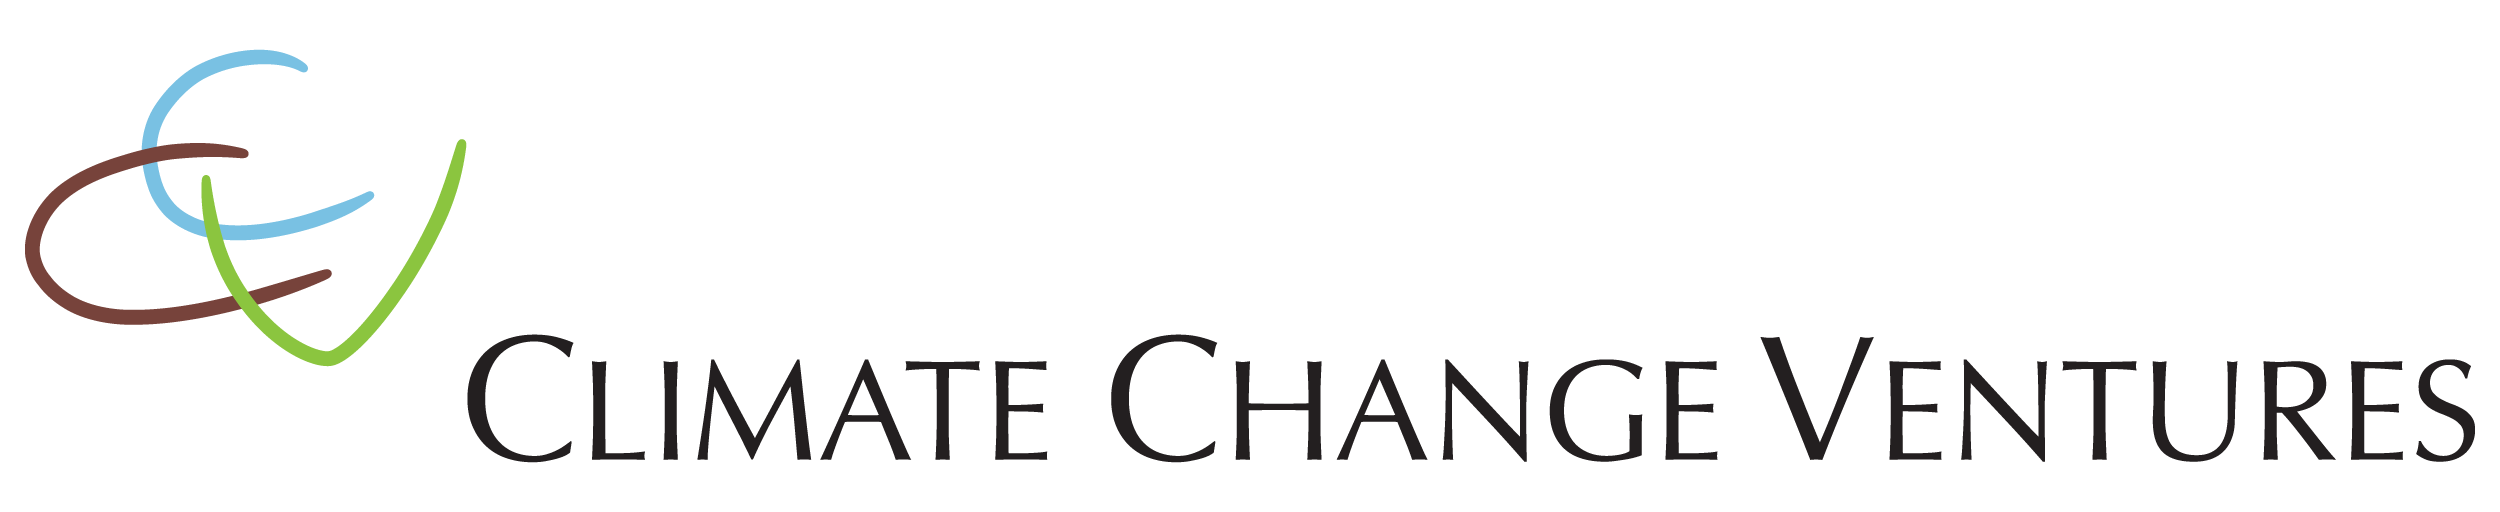 Climate Change Ventures